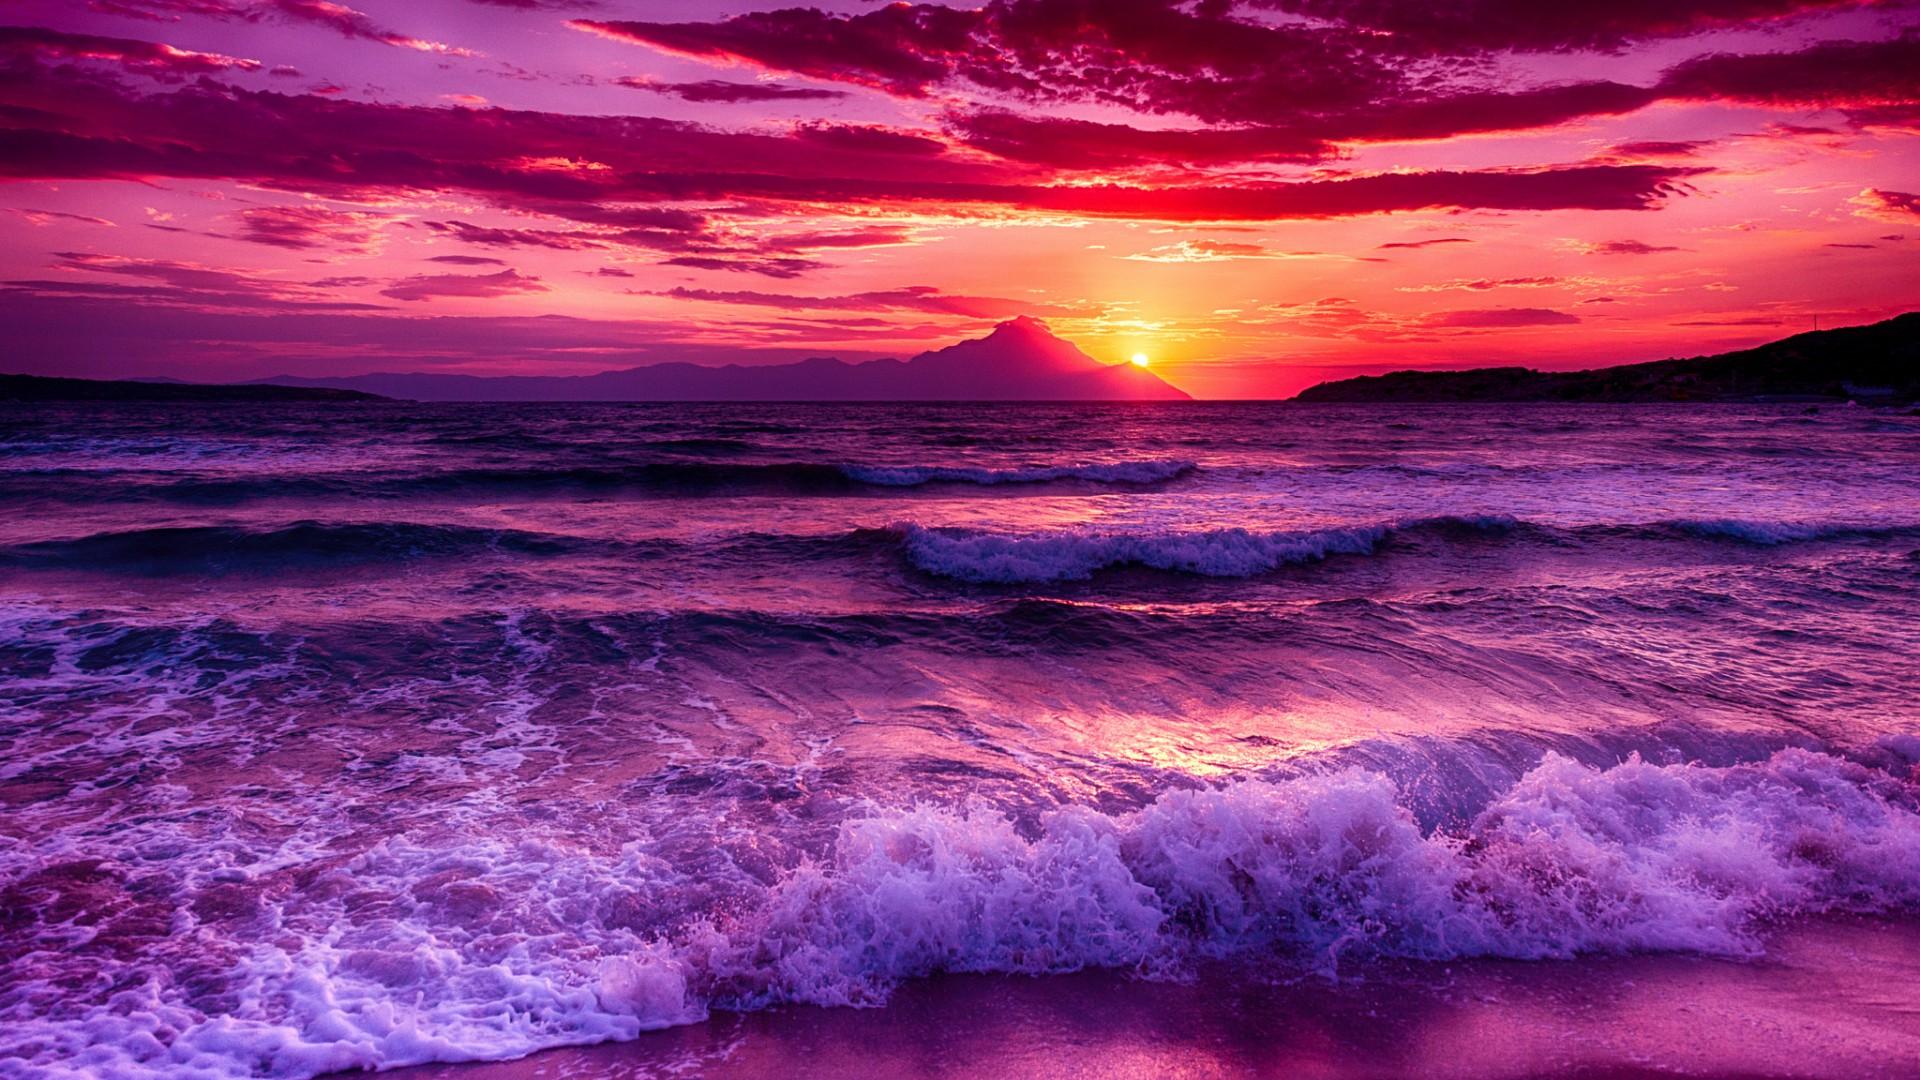 Purple sunset waterscape wallpaper